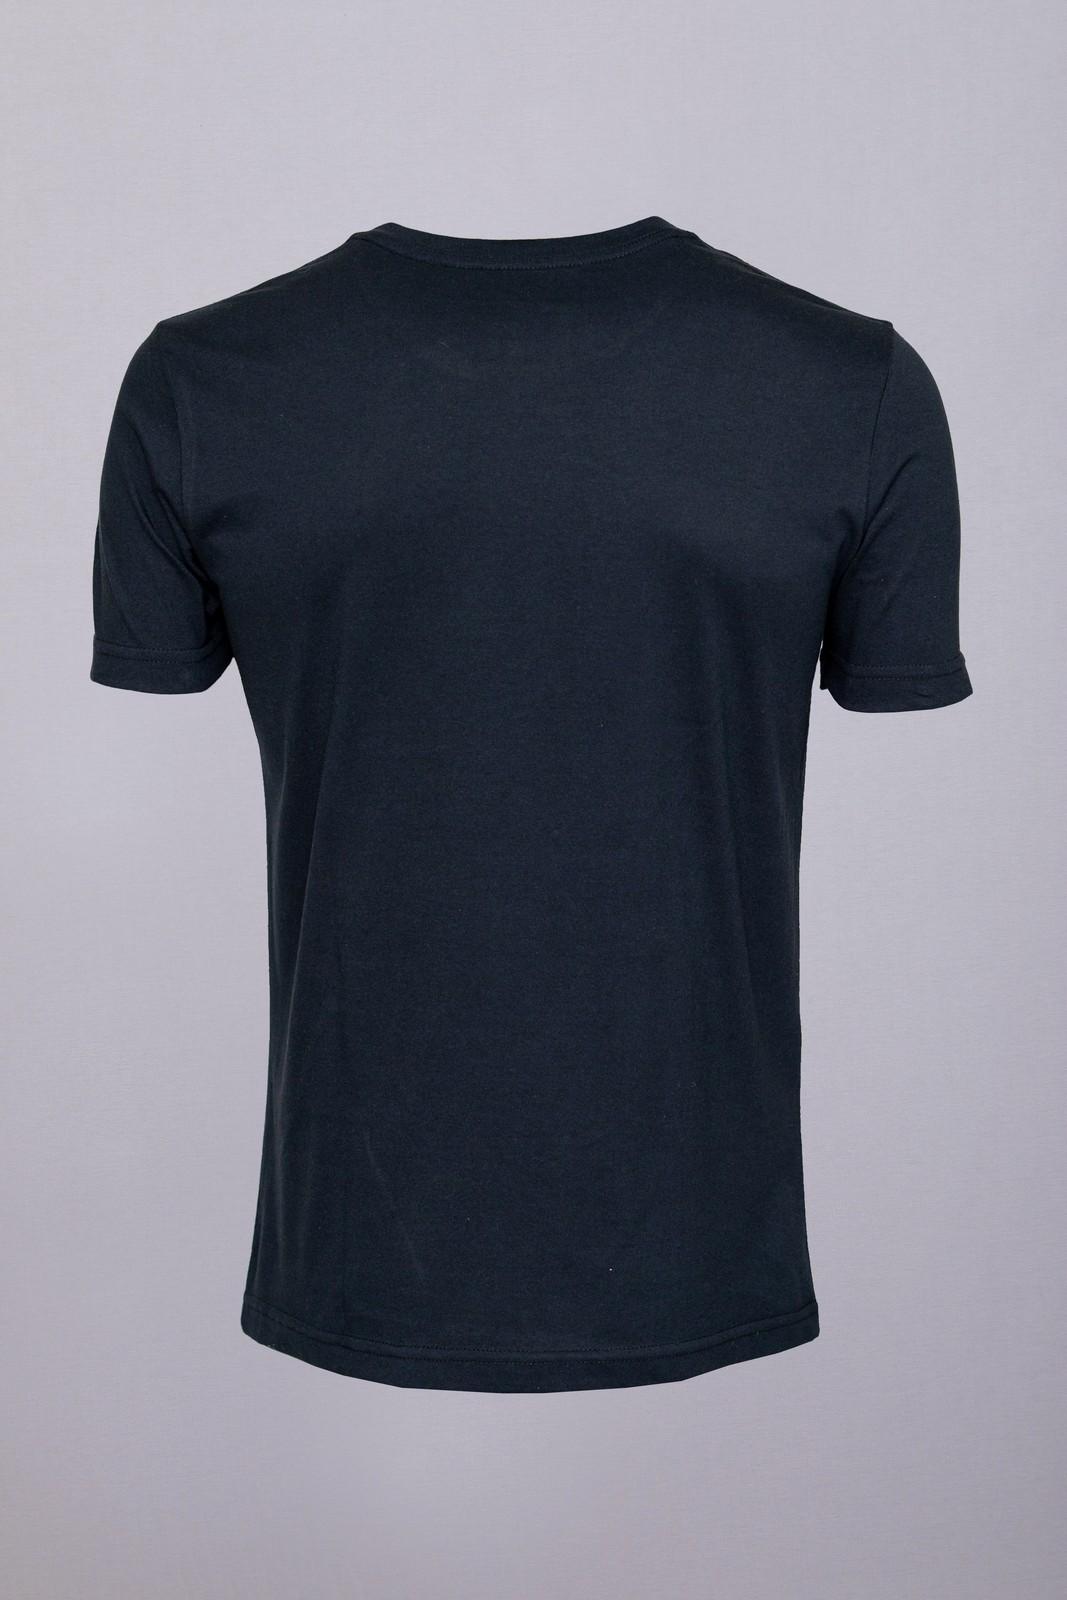 Kit Camisetas Barrocco Motos - 3 Camisetas Cor Preta/ Tamanho M